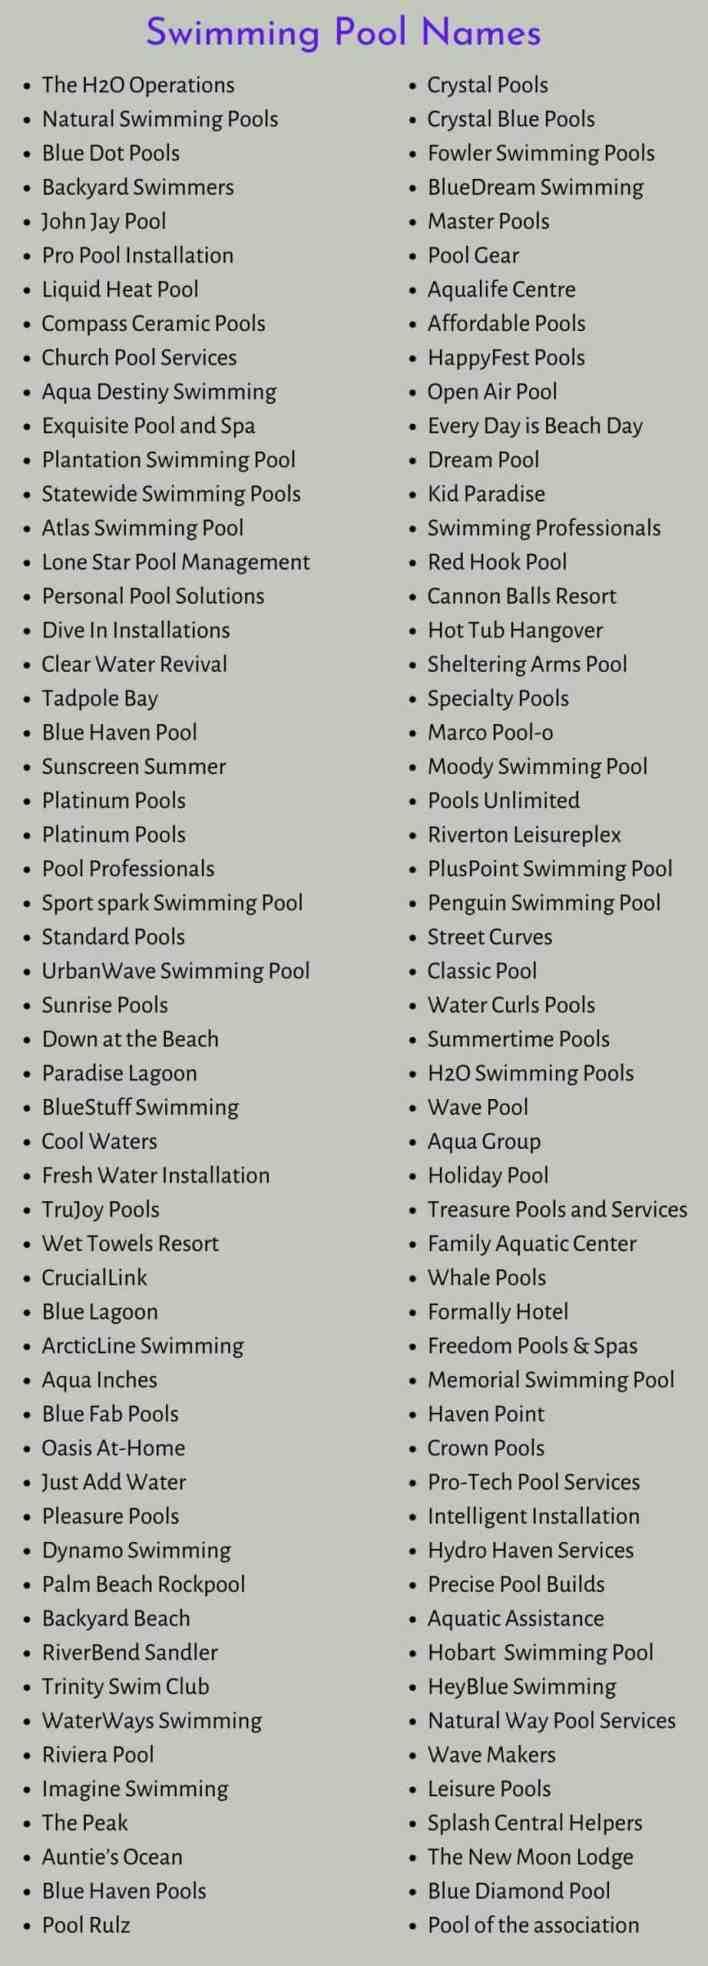 Swimming Pool Names